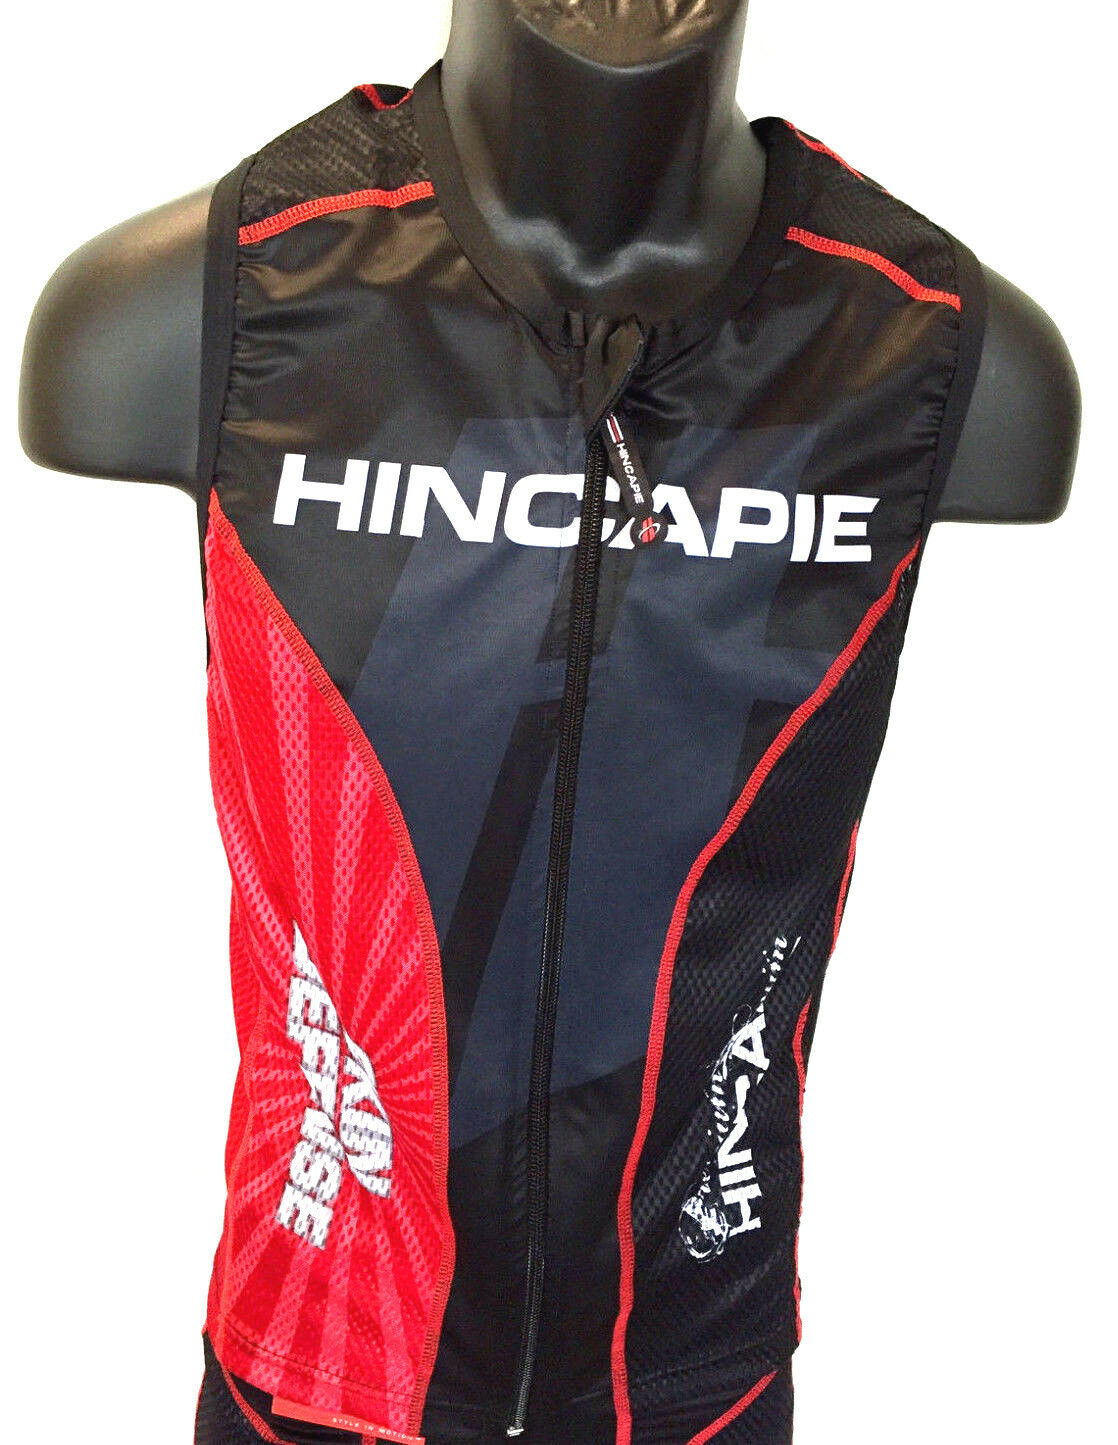 Hincapie Velocity Tri Top Large Sleeveless Triathlon  Clothing Brand New   fantastic quality